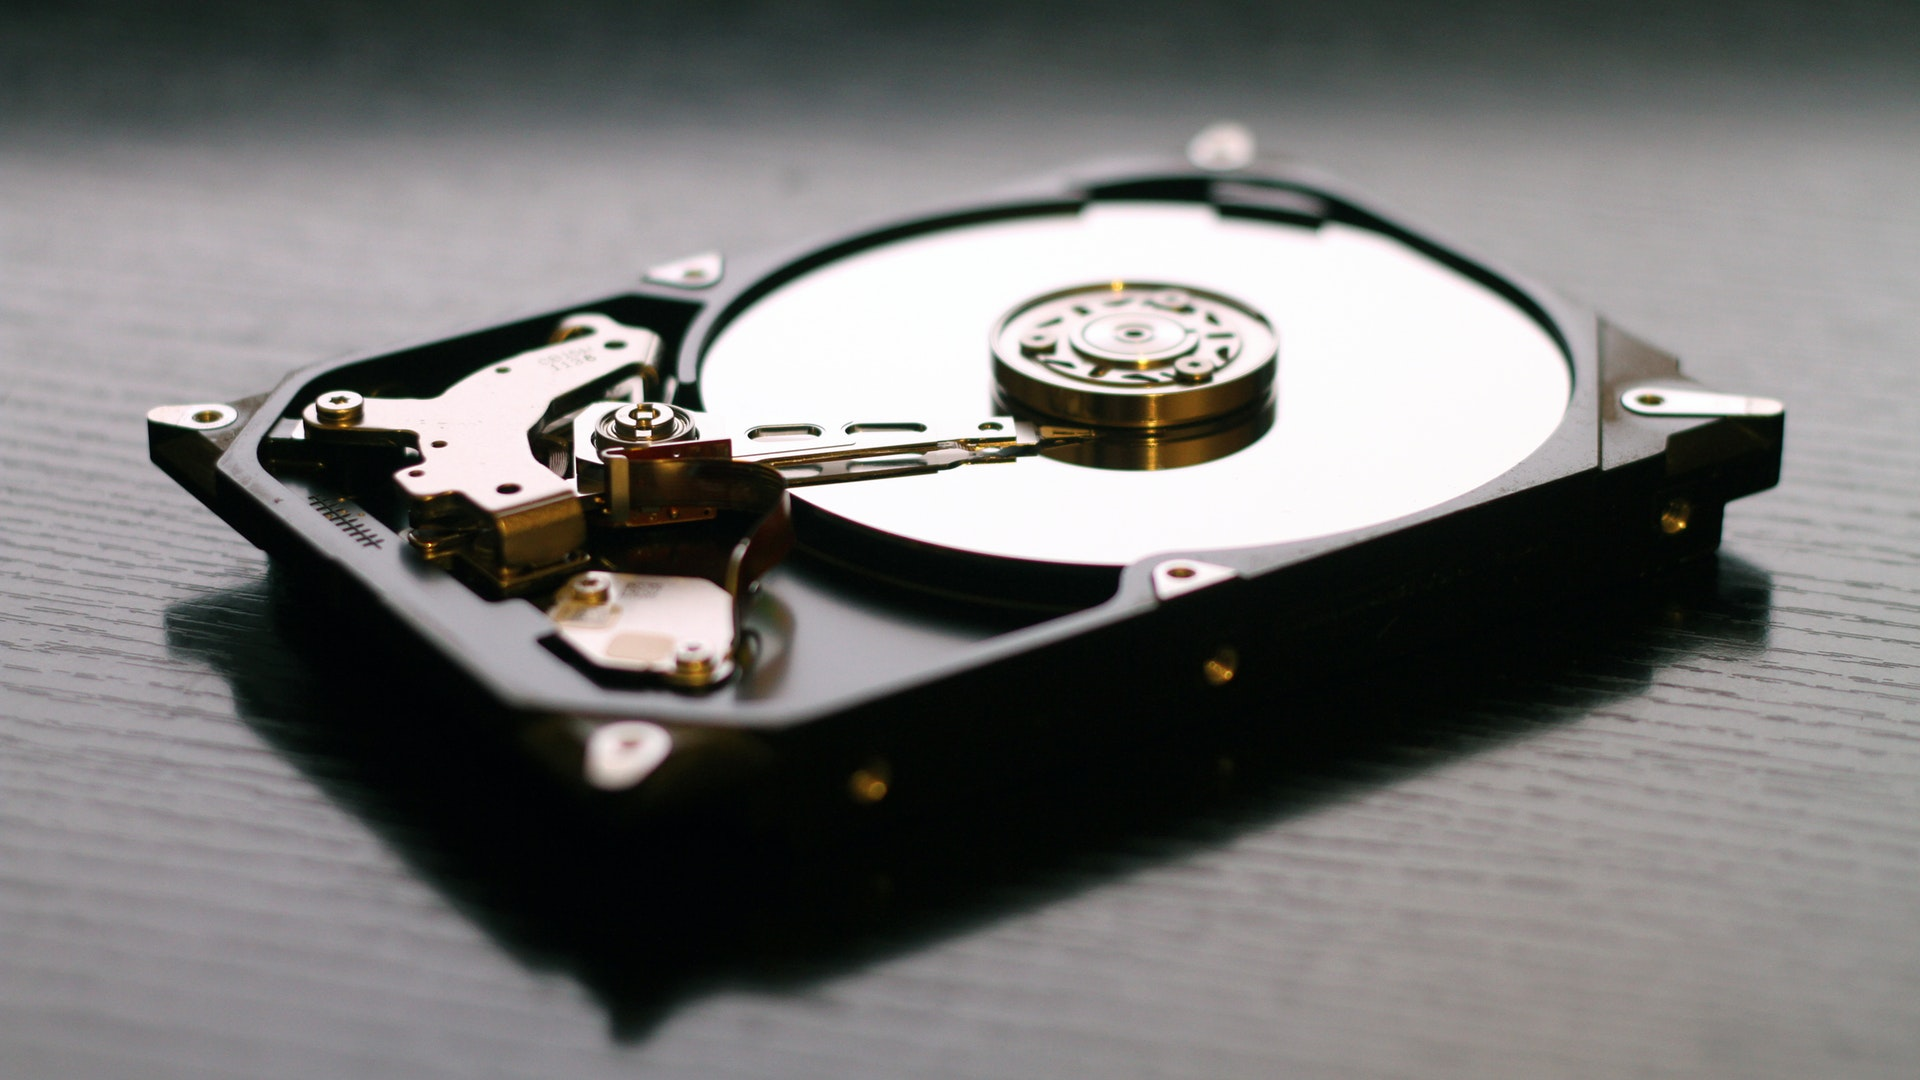 Hard drive on table